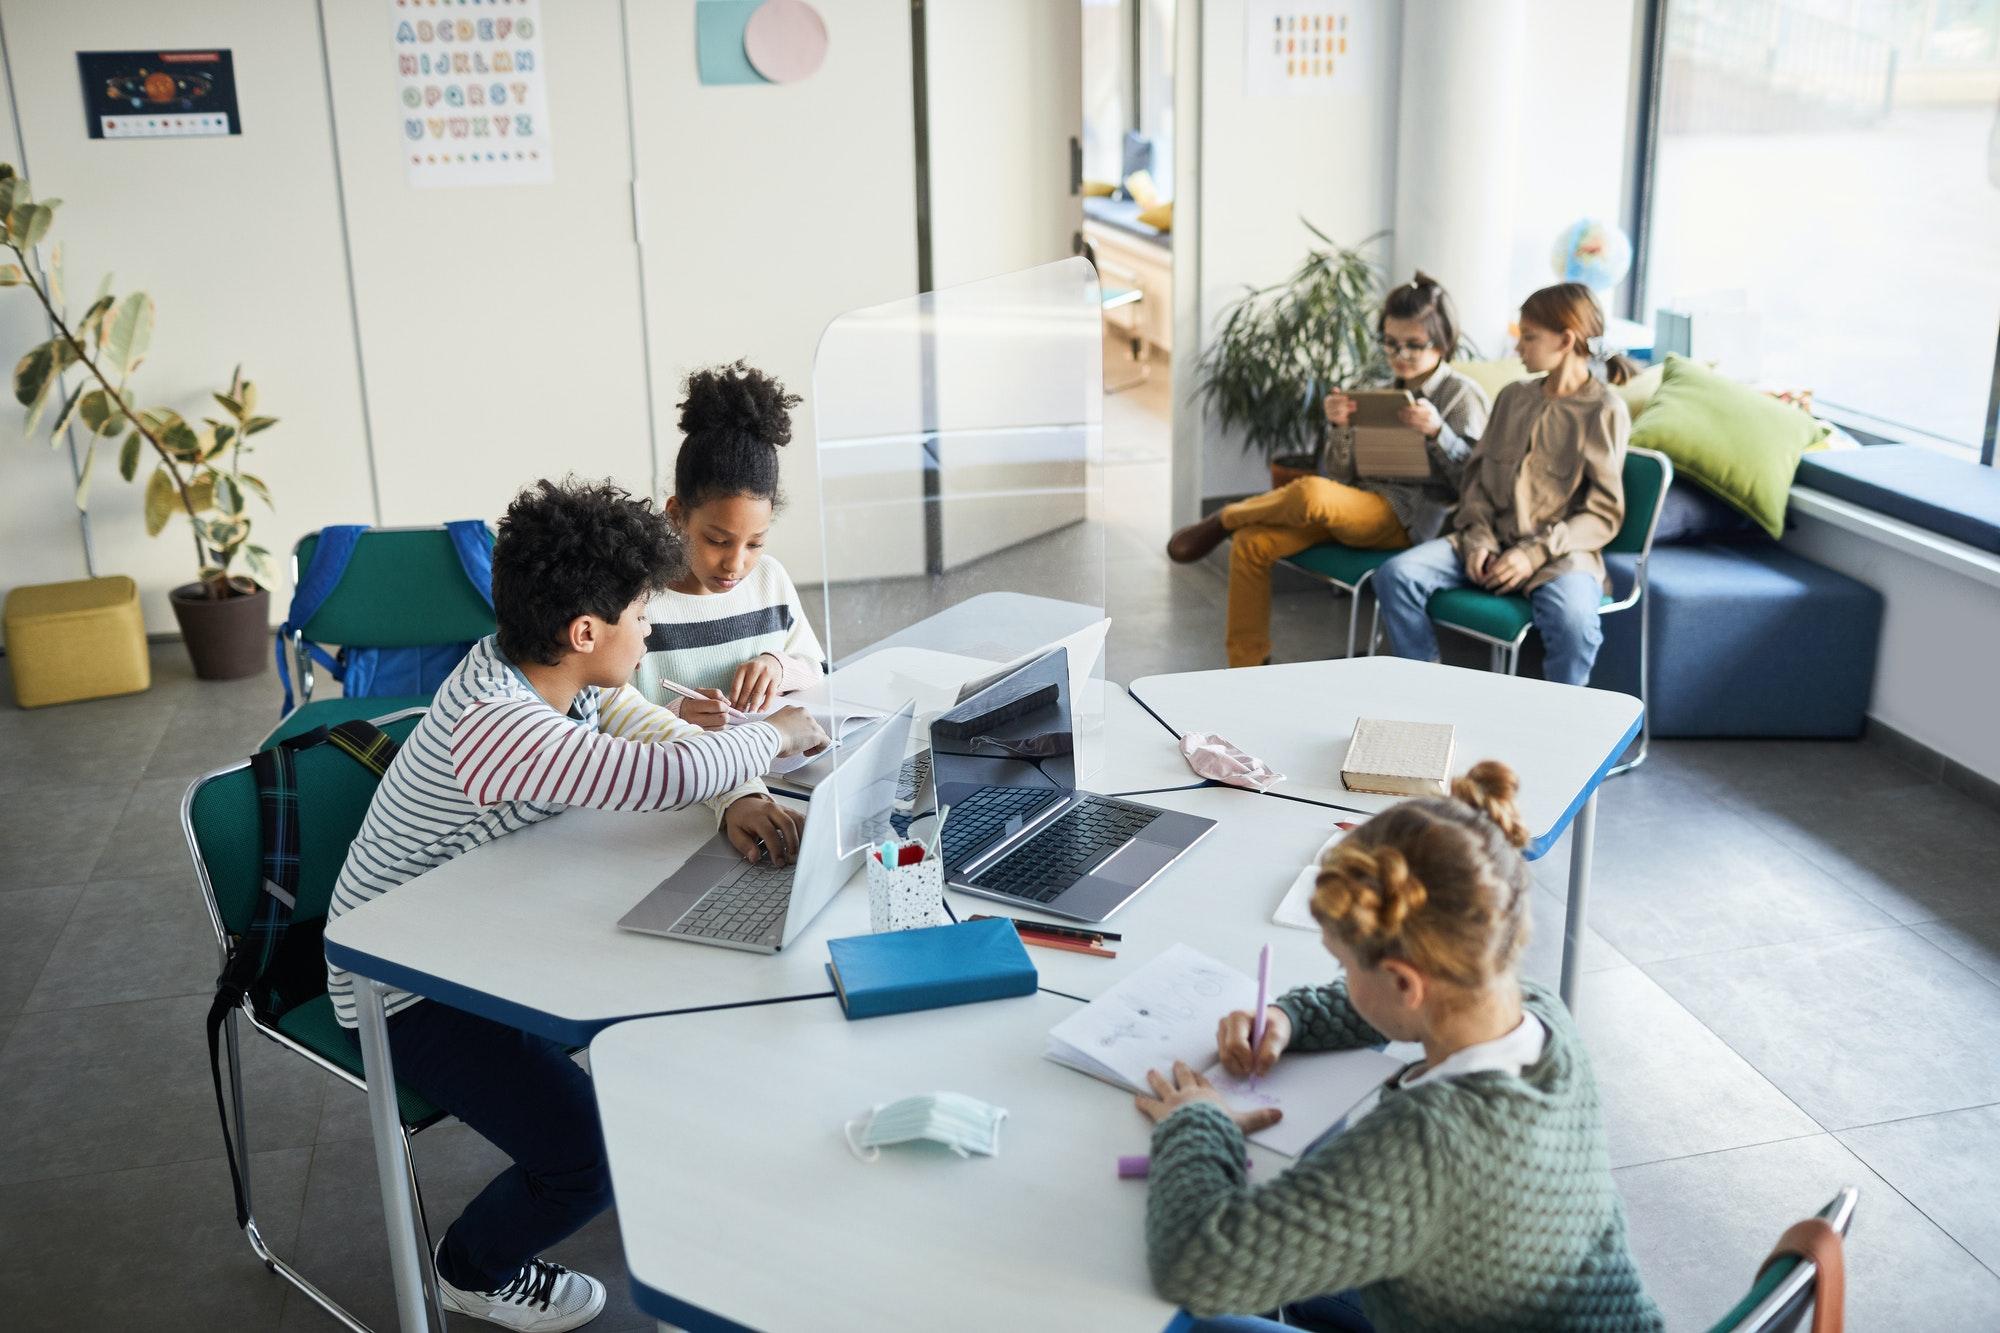 Children Studying Together